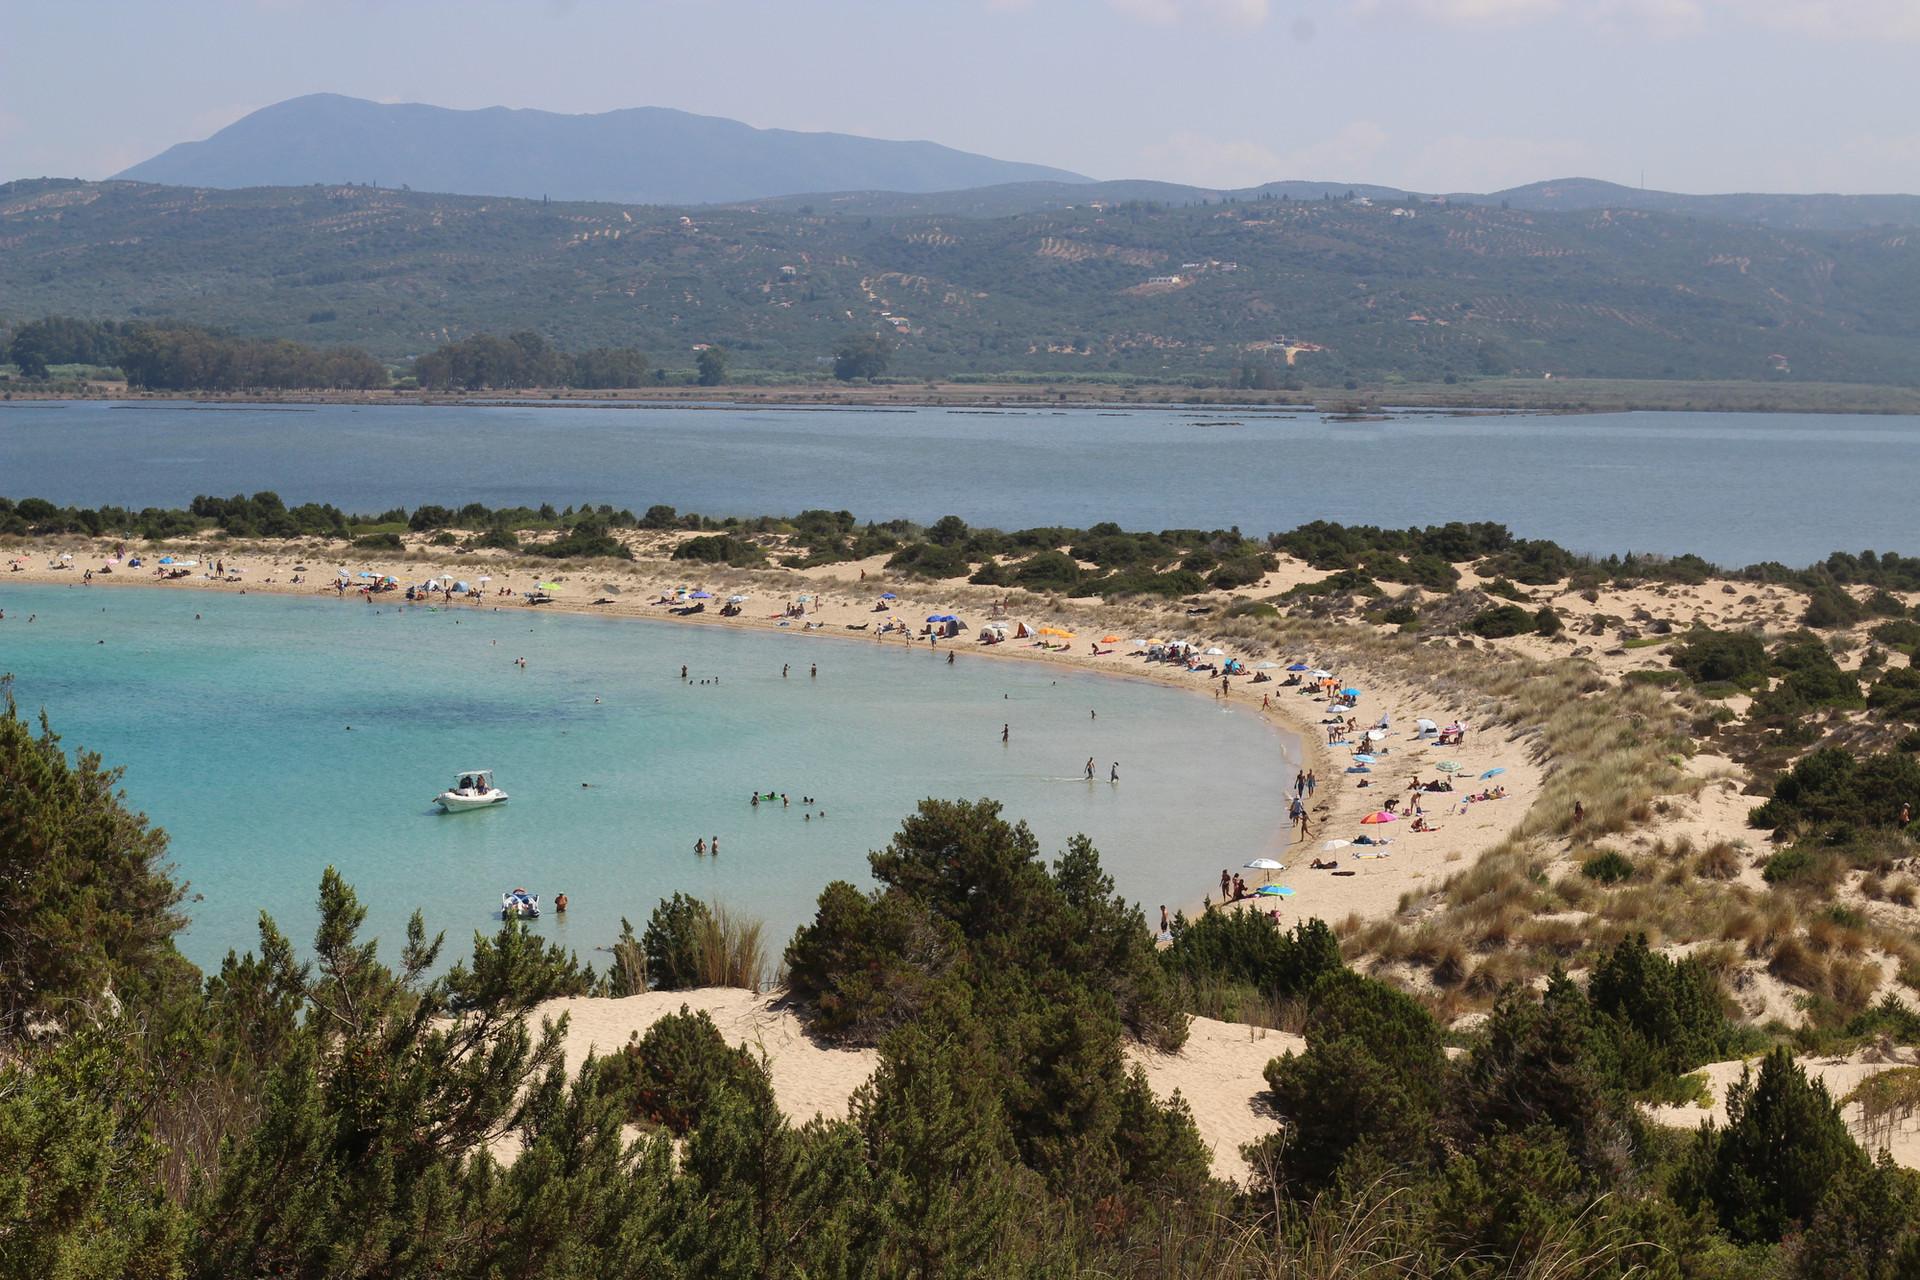 Baia di Navarino, Voudakilia Beach